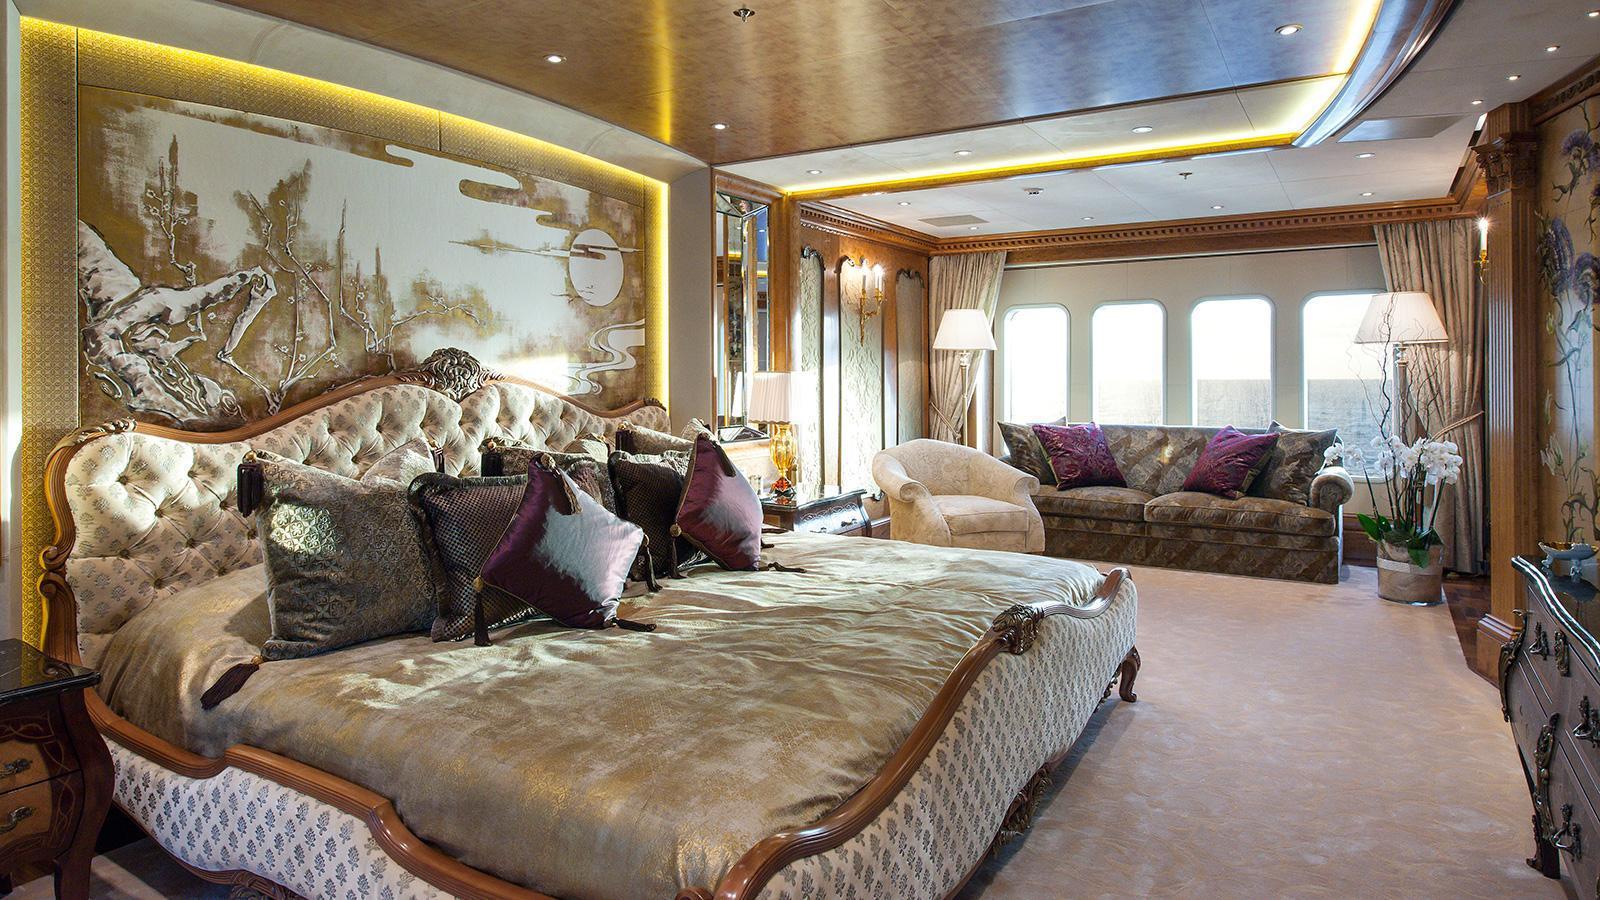 iroquois ester iii motor yacht lurssen 2014 66m state room